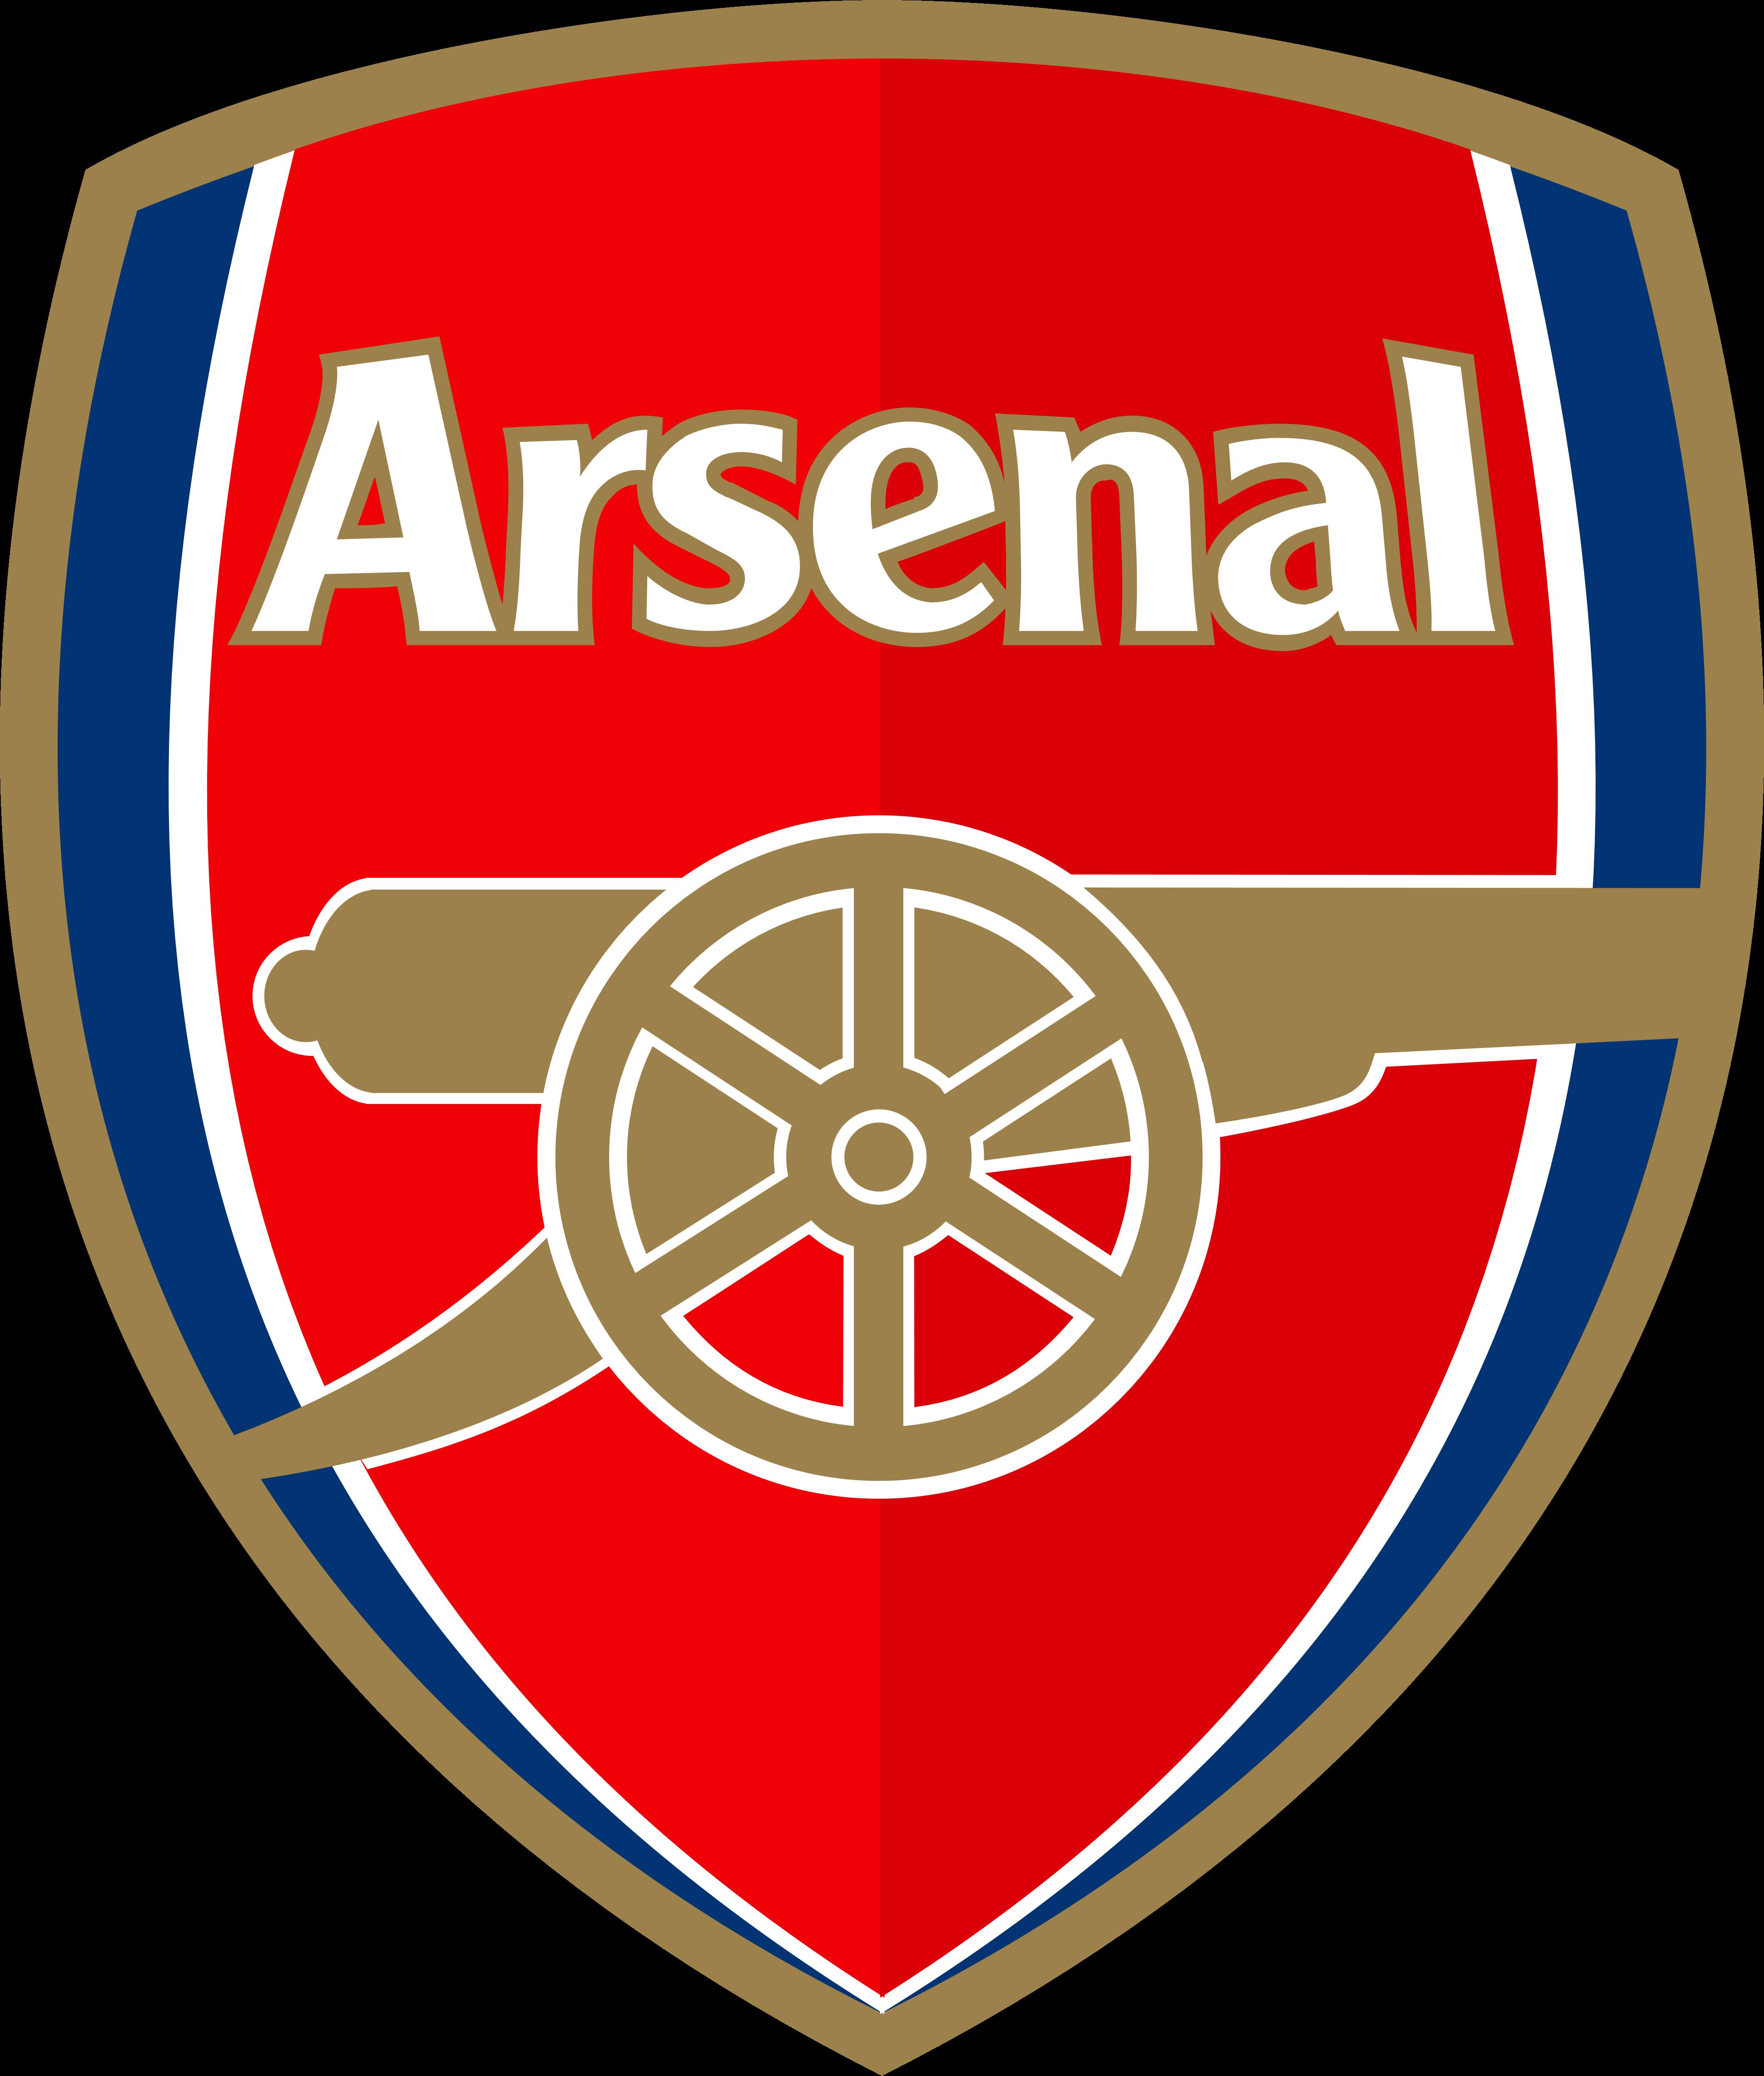 Télécharger photo logo arsenal png